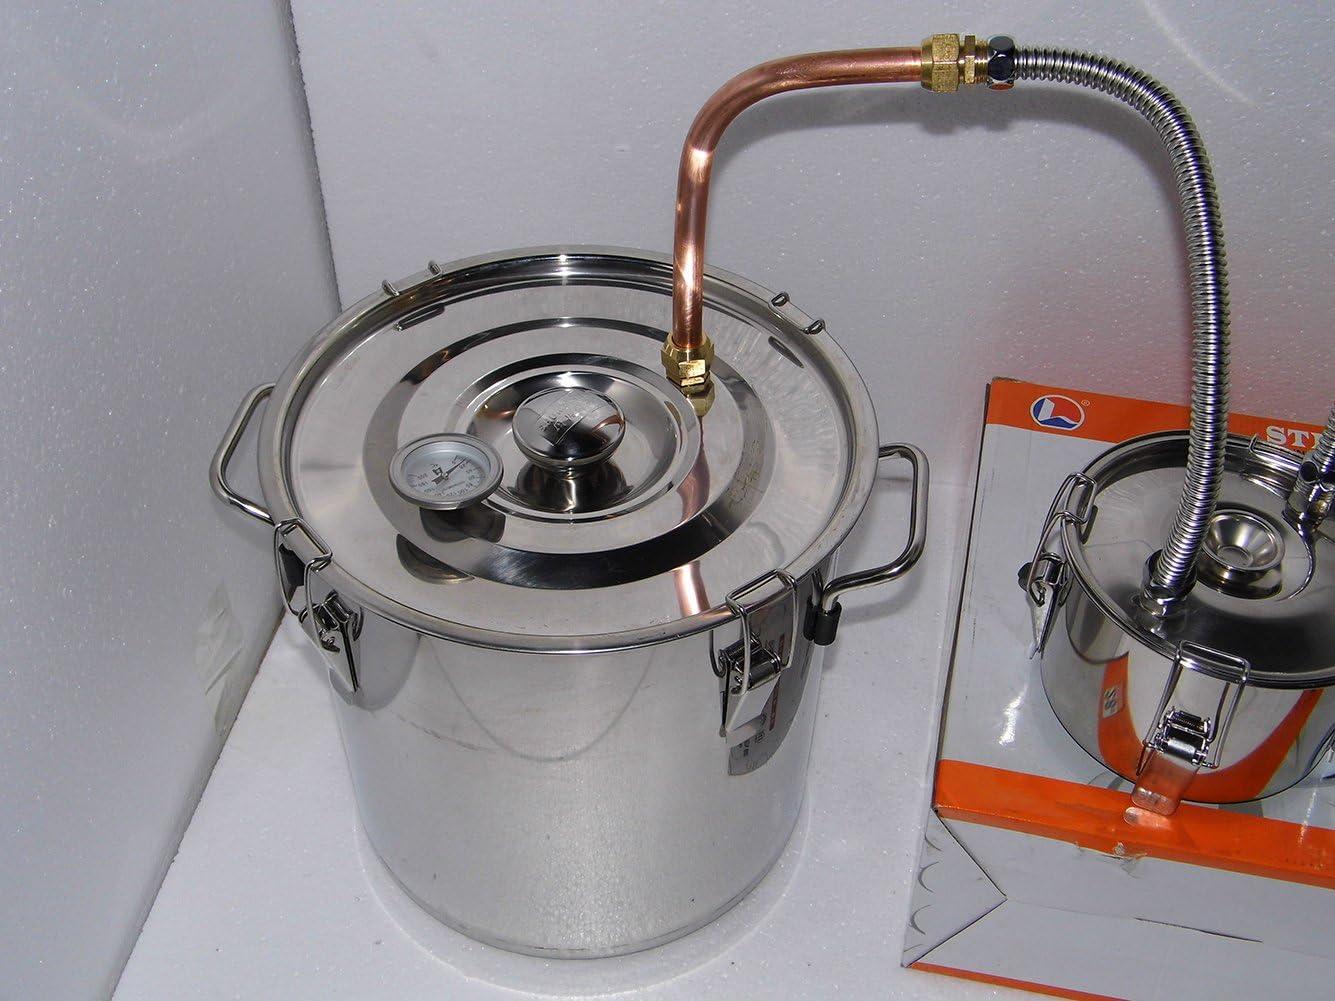 OLizee 2 Gallon Stainless Steel Water Alcohol Distiller Copper Home Brew Moonshine Still Spirits 8L Wine Making